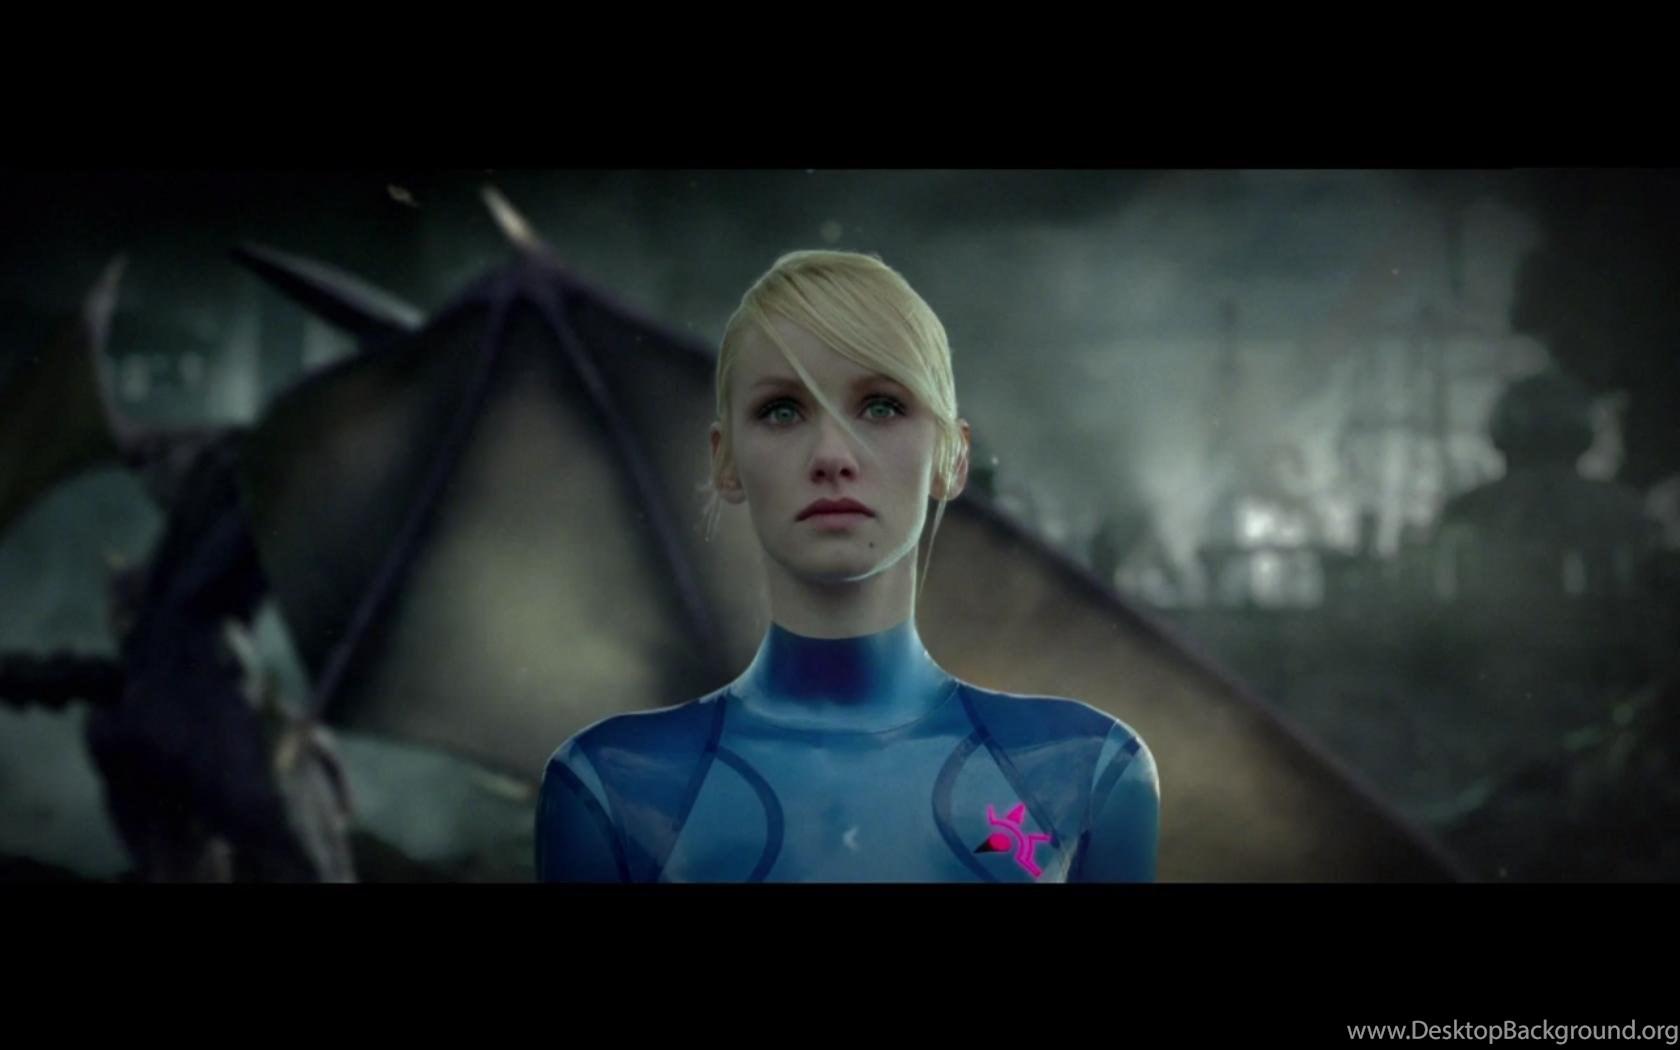 Blondes Metroid Women Cosplay Zero Suit Samus Aran Wallpapers